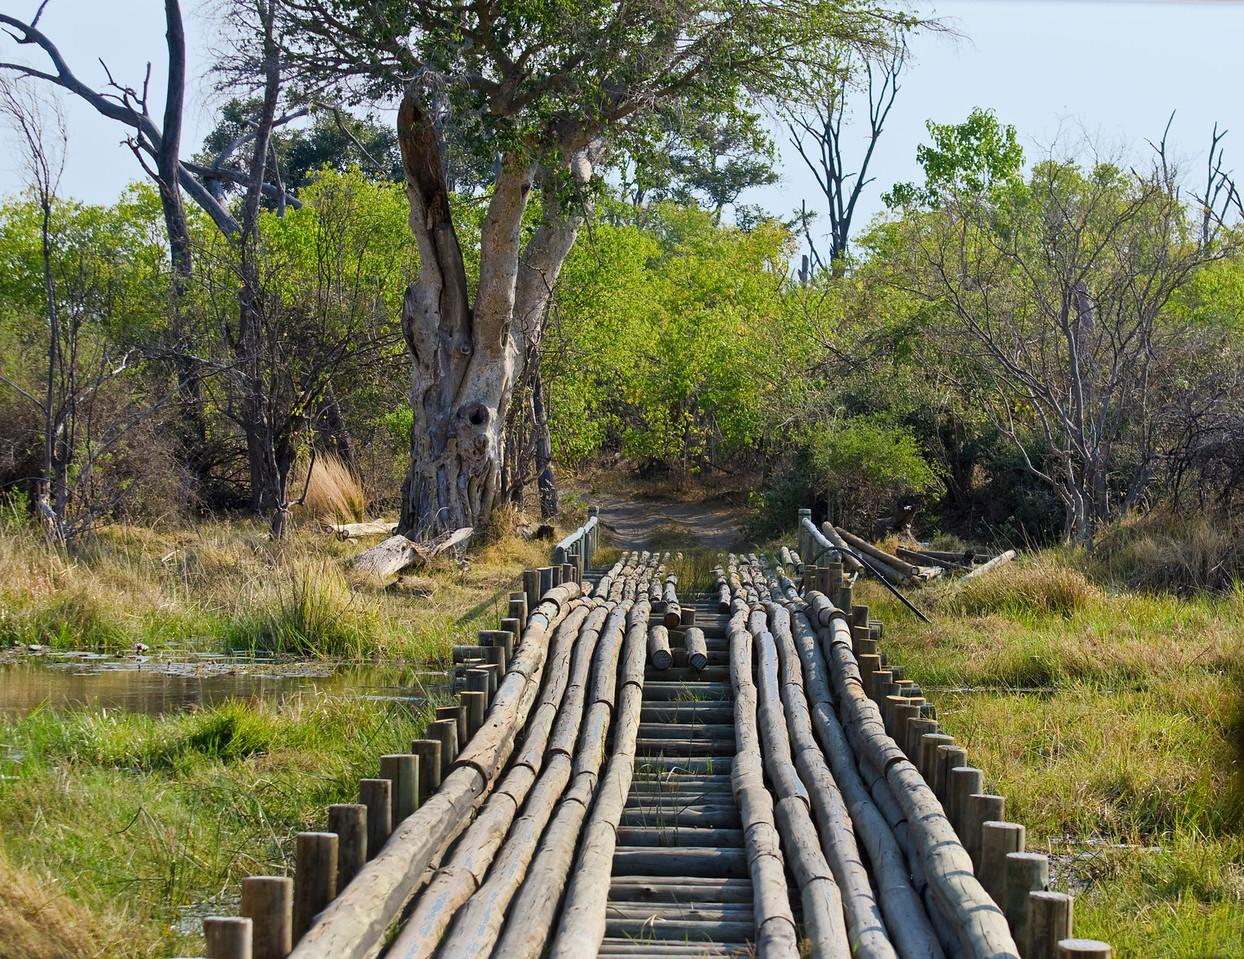 Bridge Over The River Kwaii